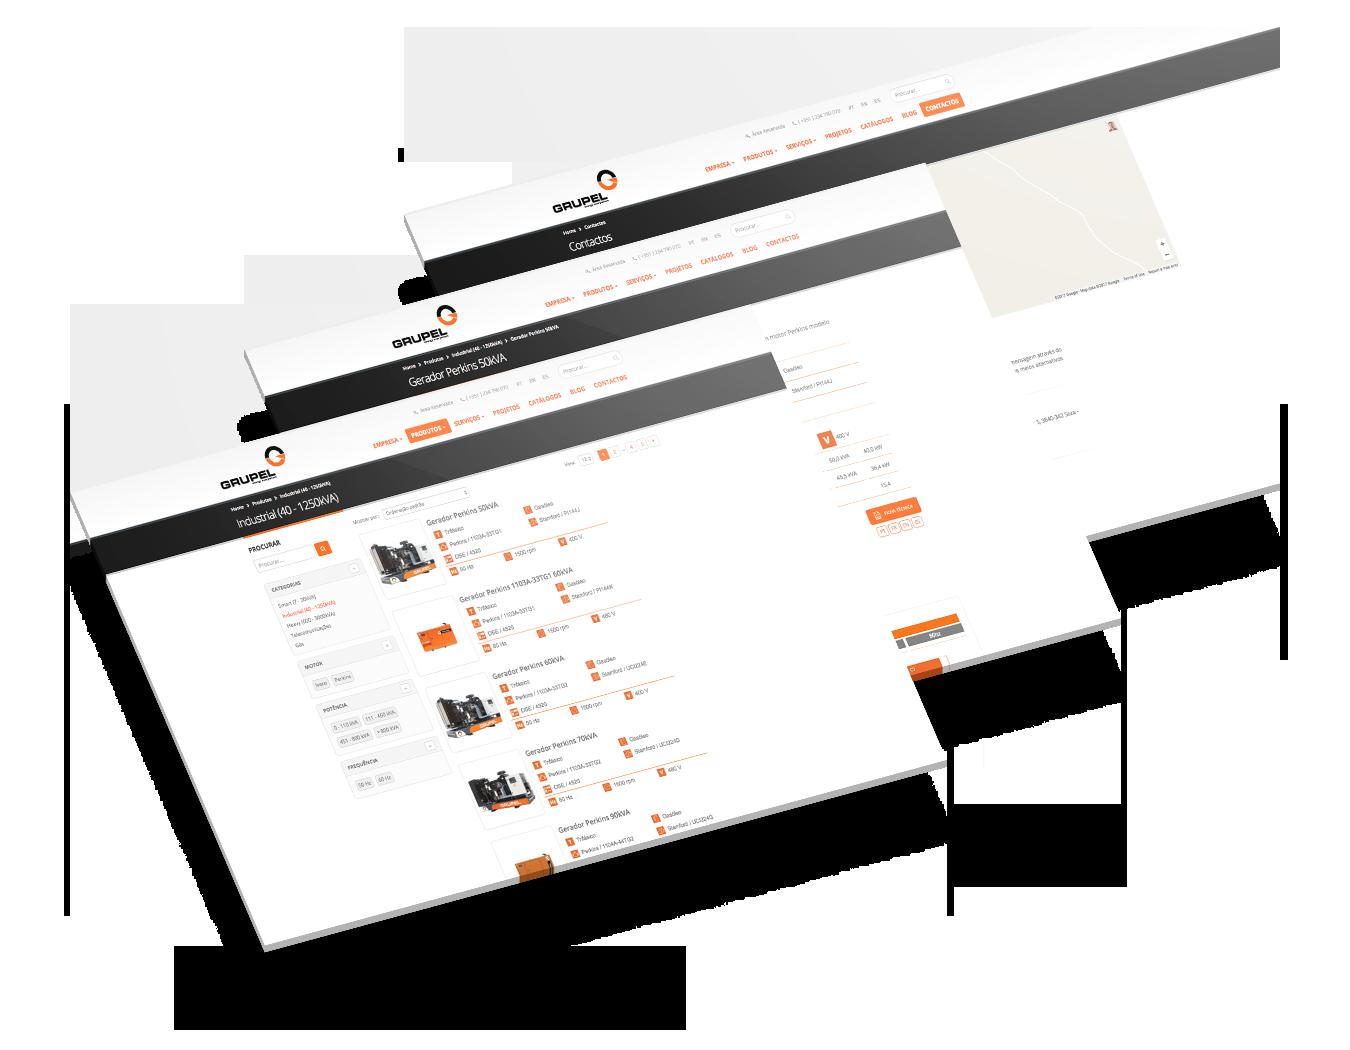 grupel-paginas-website-3d